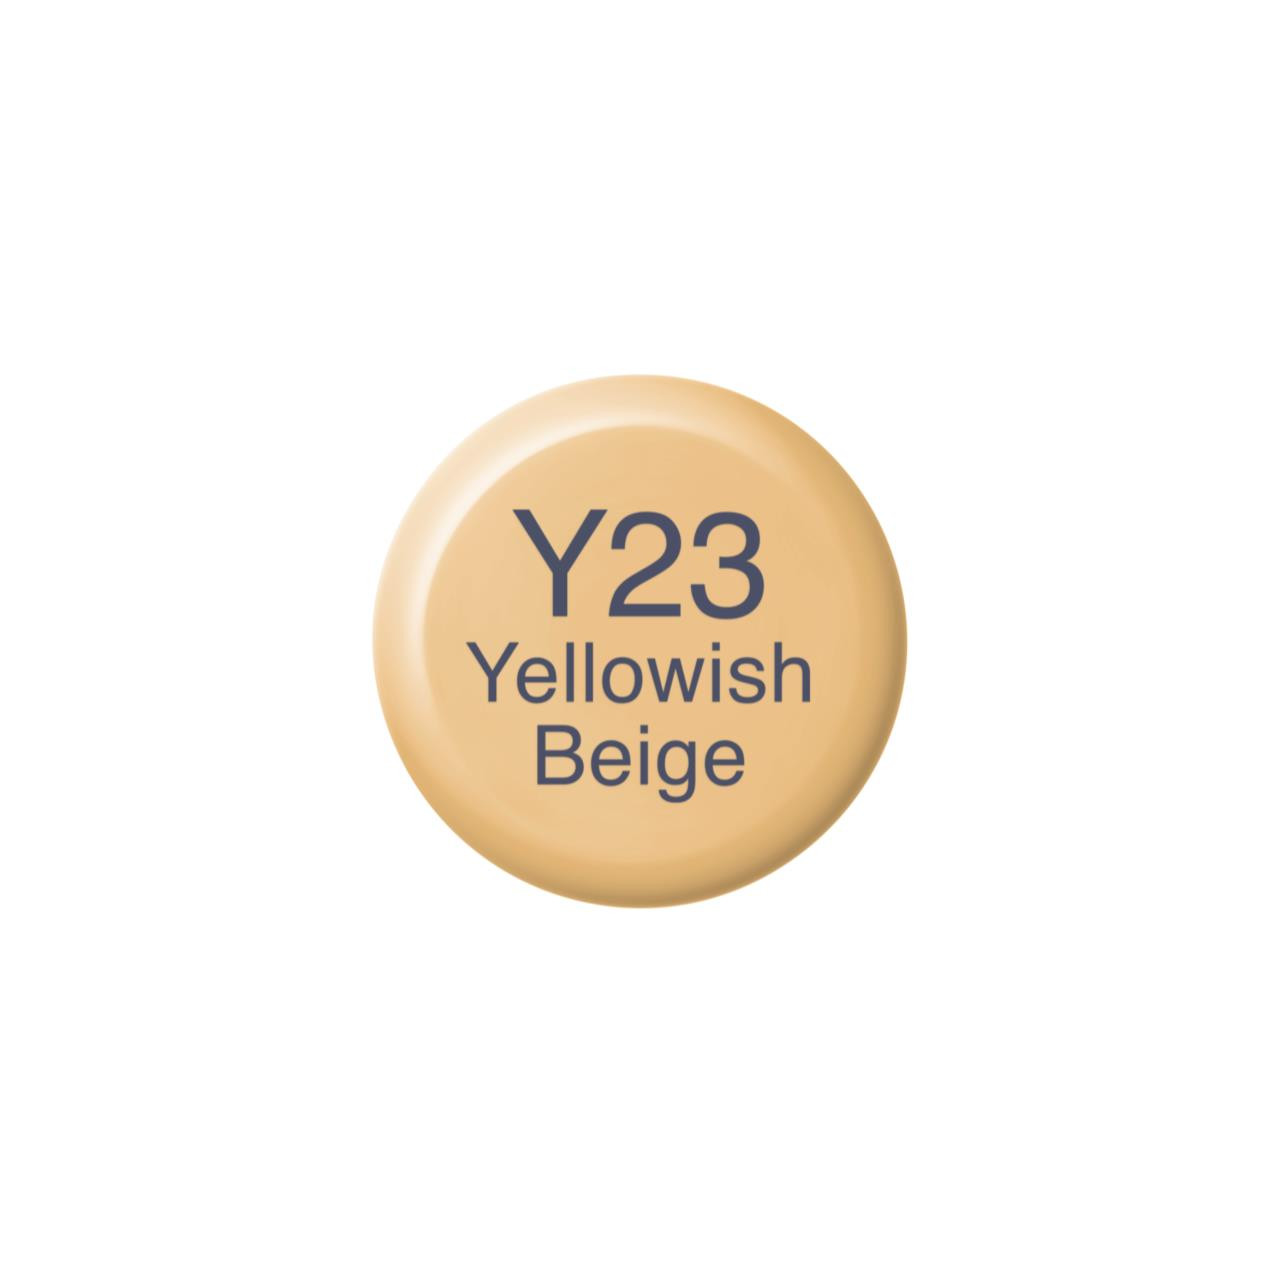 Y23 Yellowish Beige, Copic Ink - 4511338058275